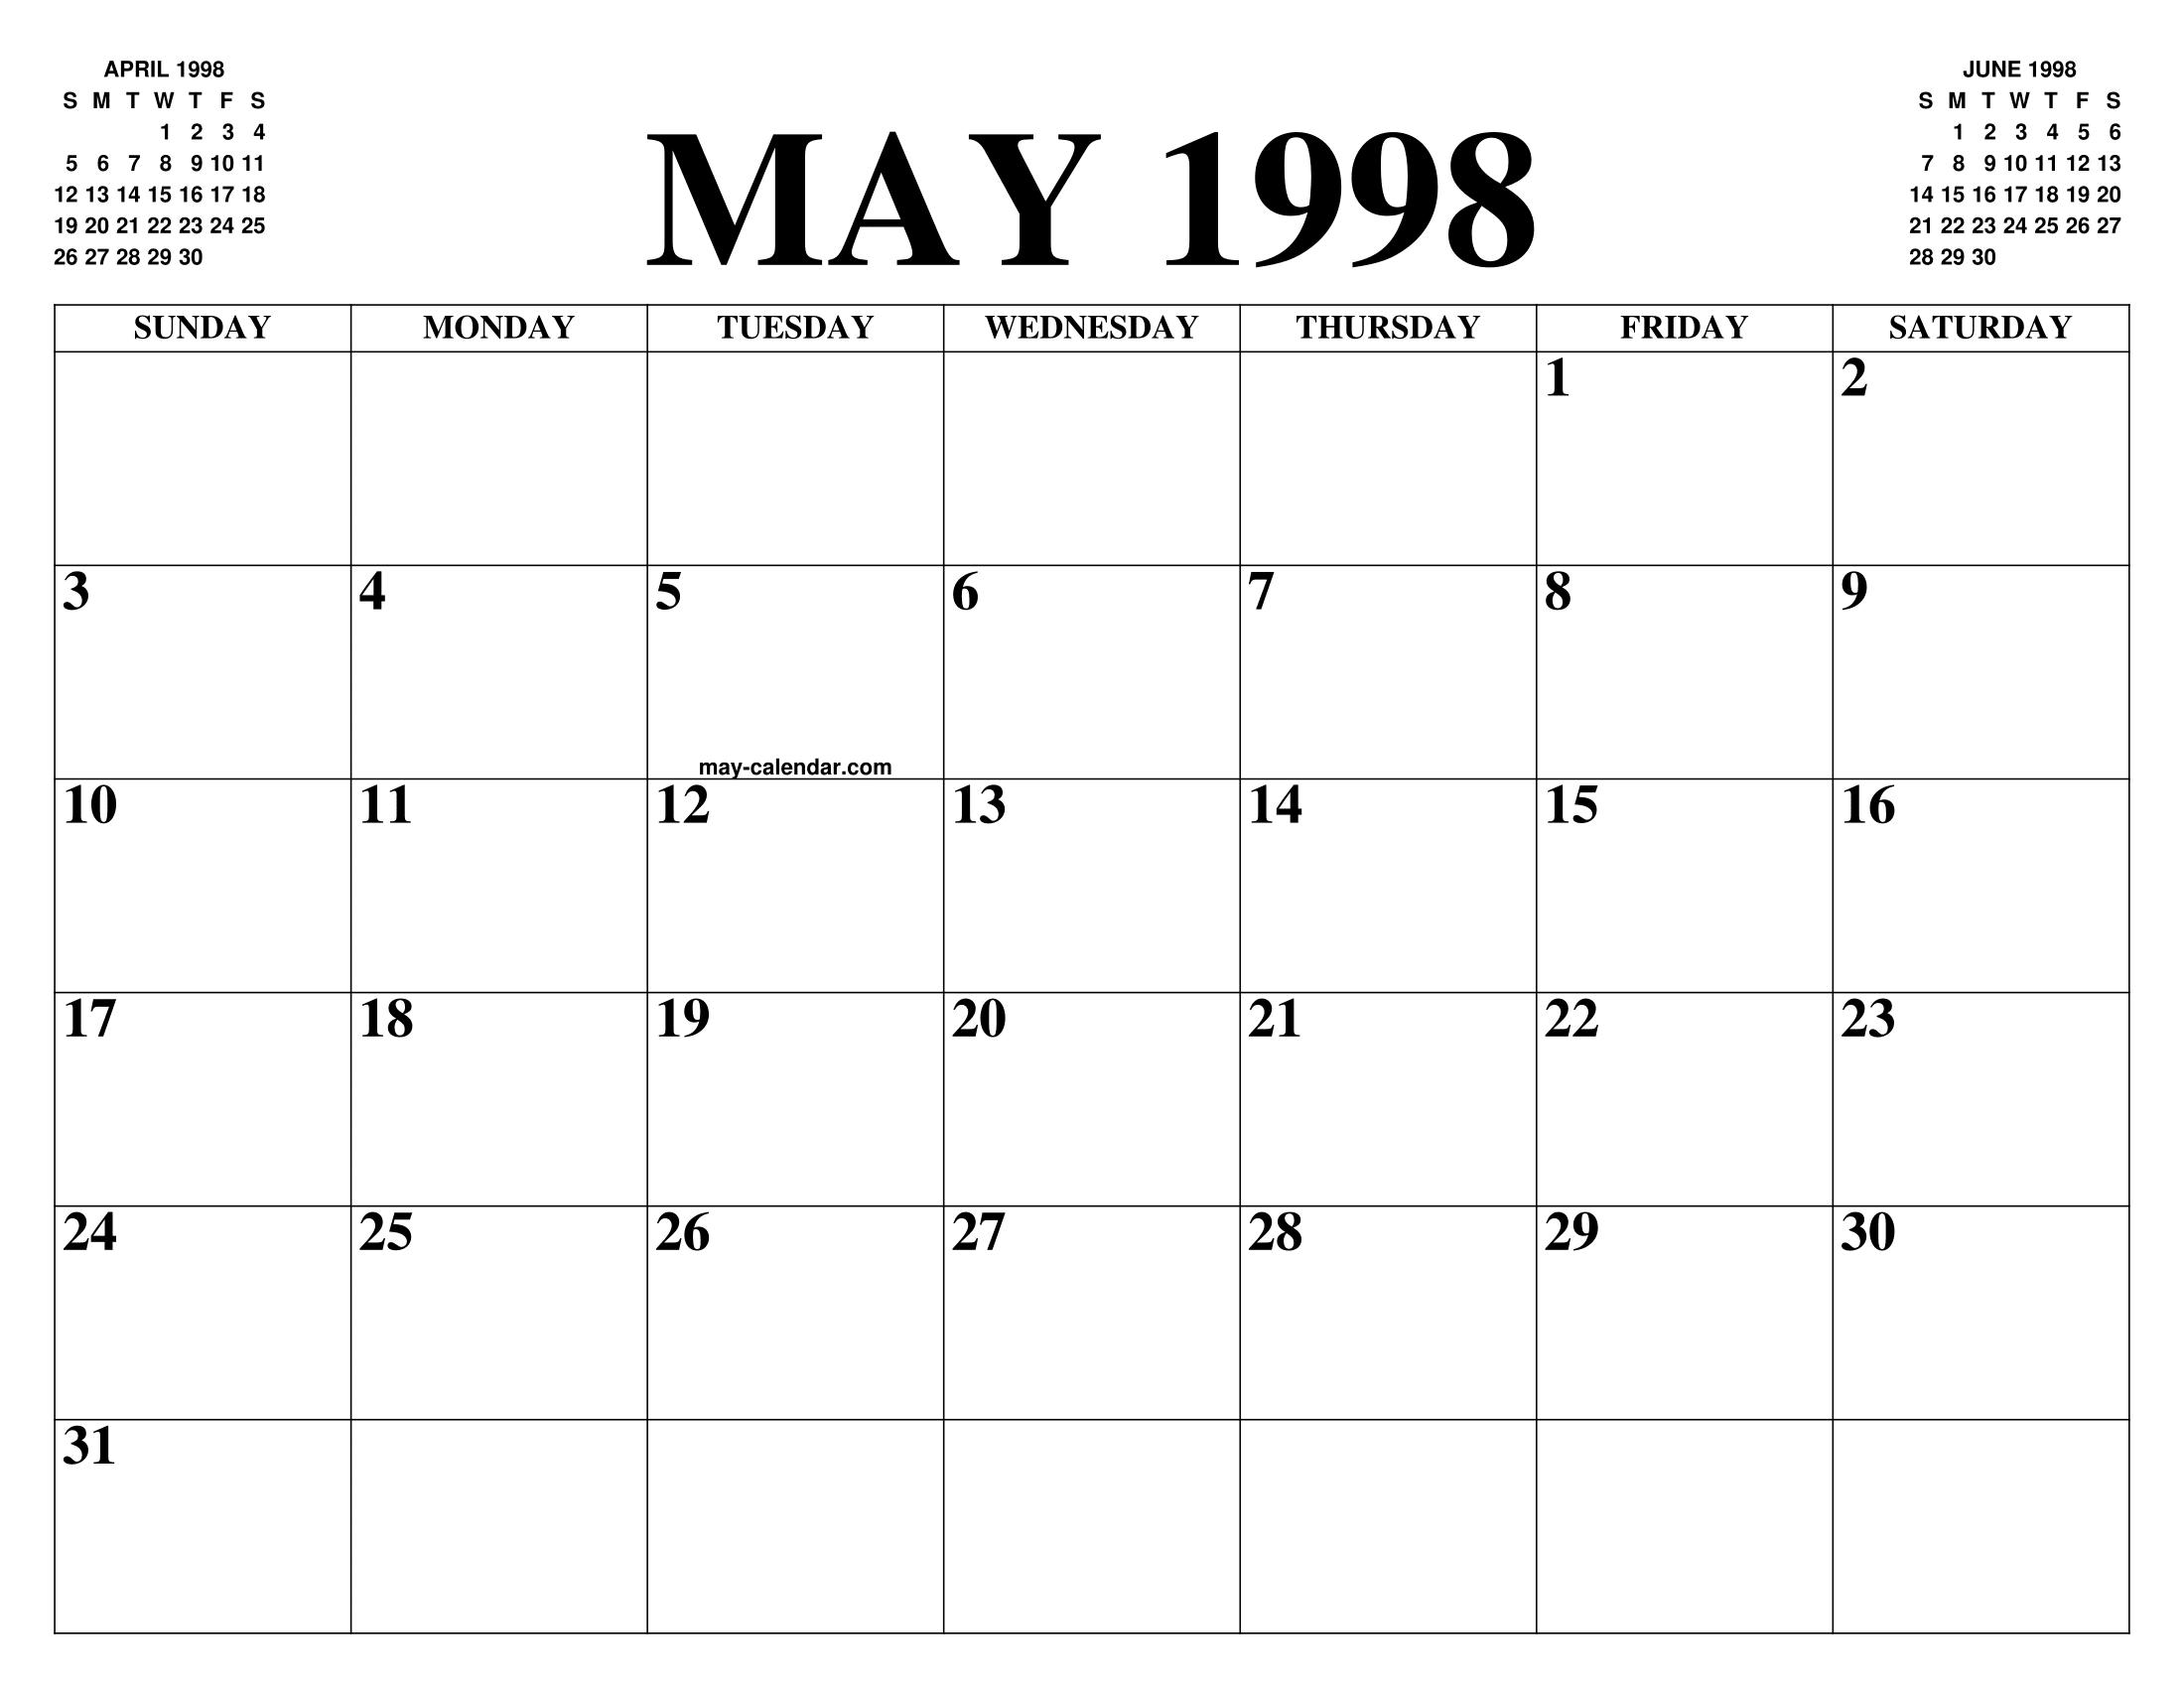 1998 Calendario.May 1998 Calendar Of The Month Free Printable May Calendar